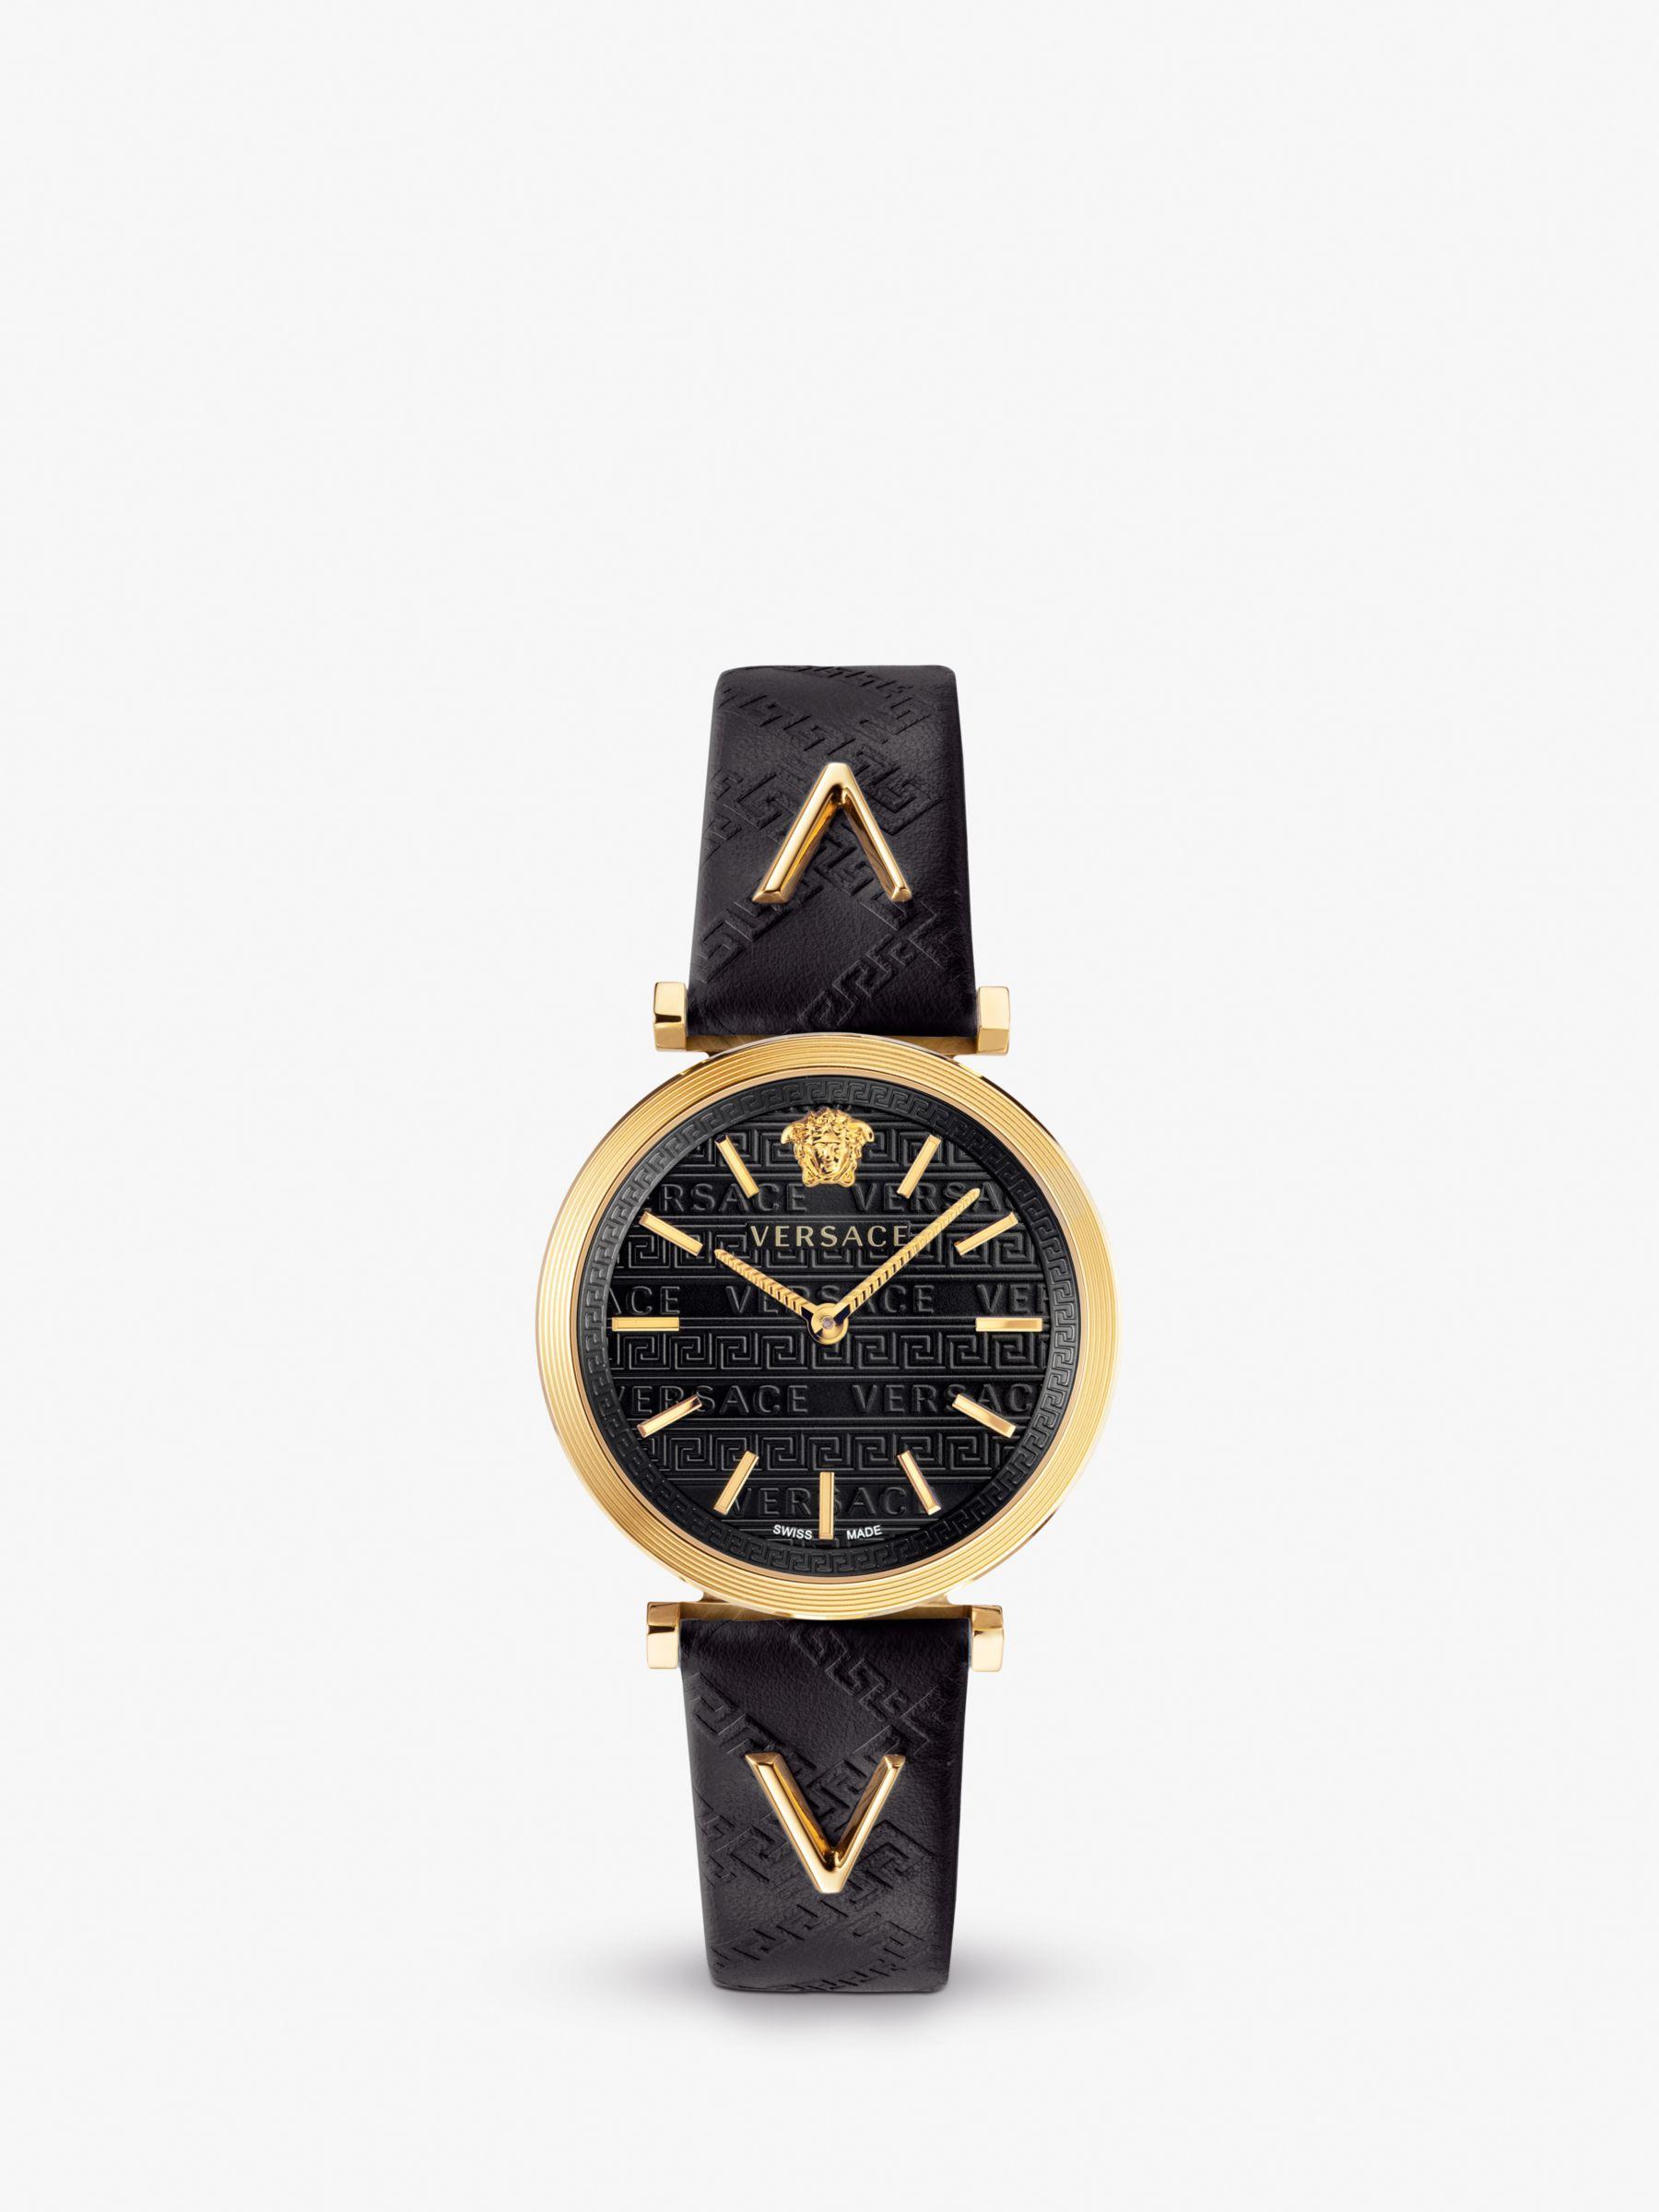 Versace Versace VELS00619 Women's Twist Leather Strap Watch, Black/Gold